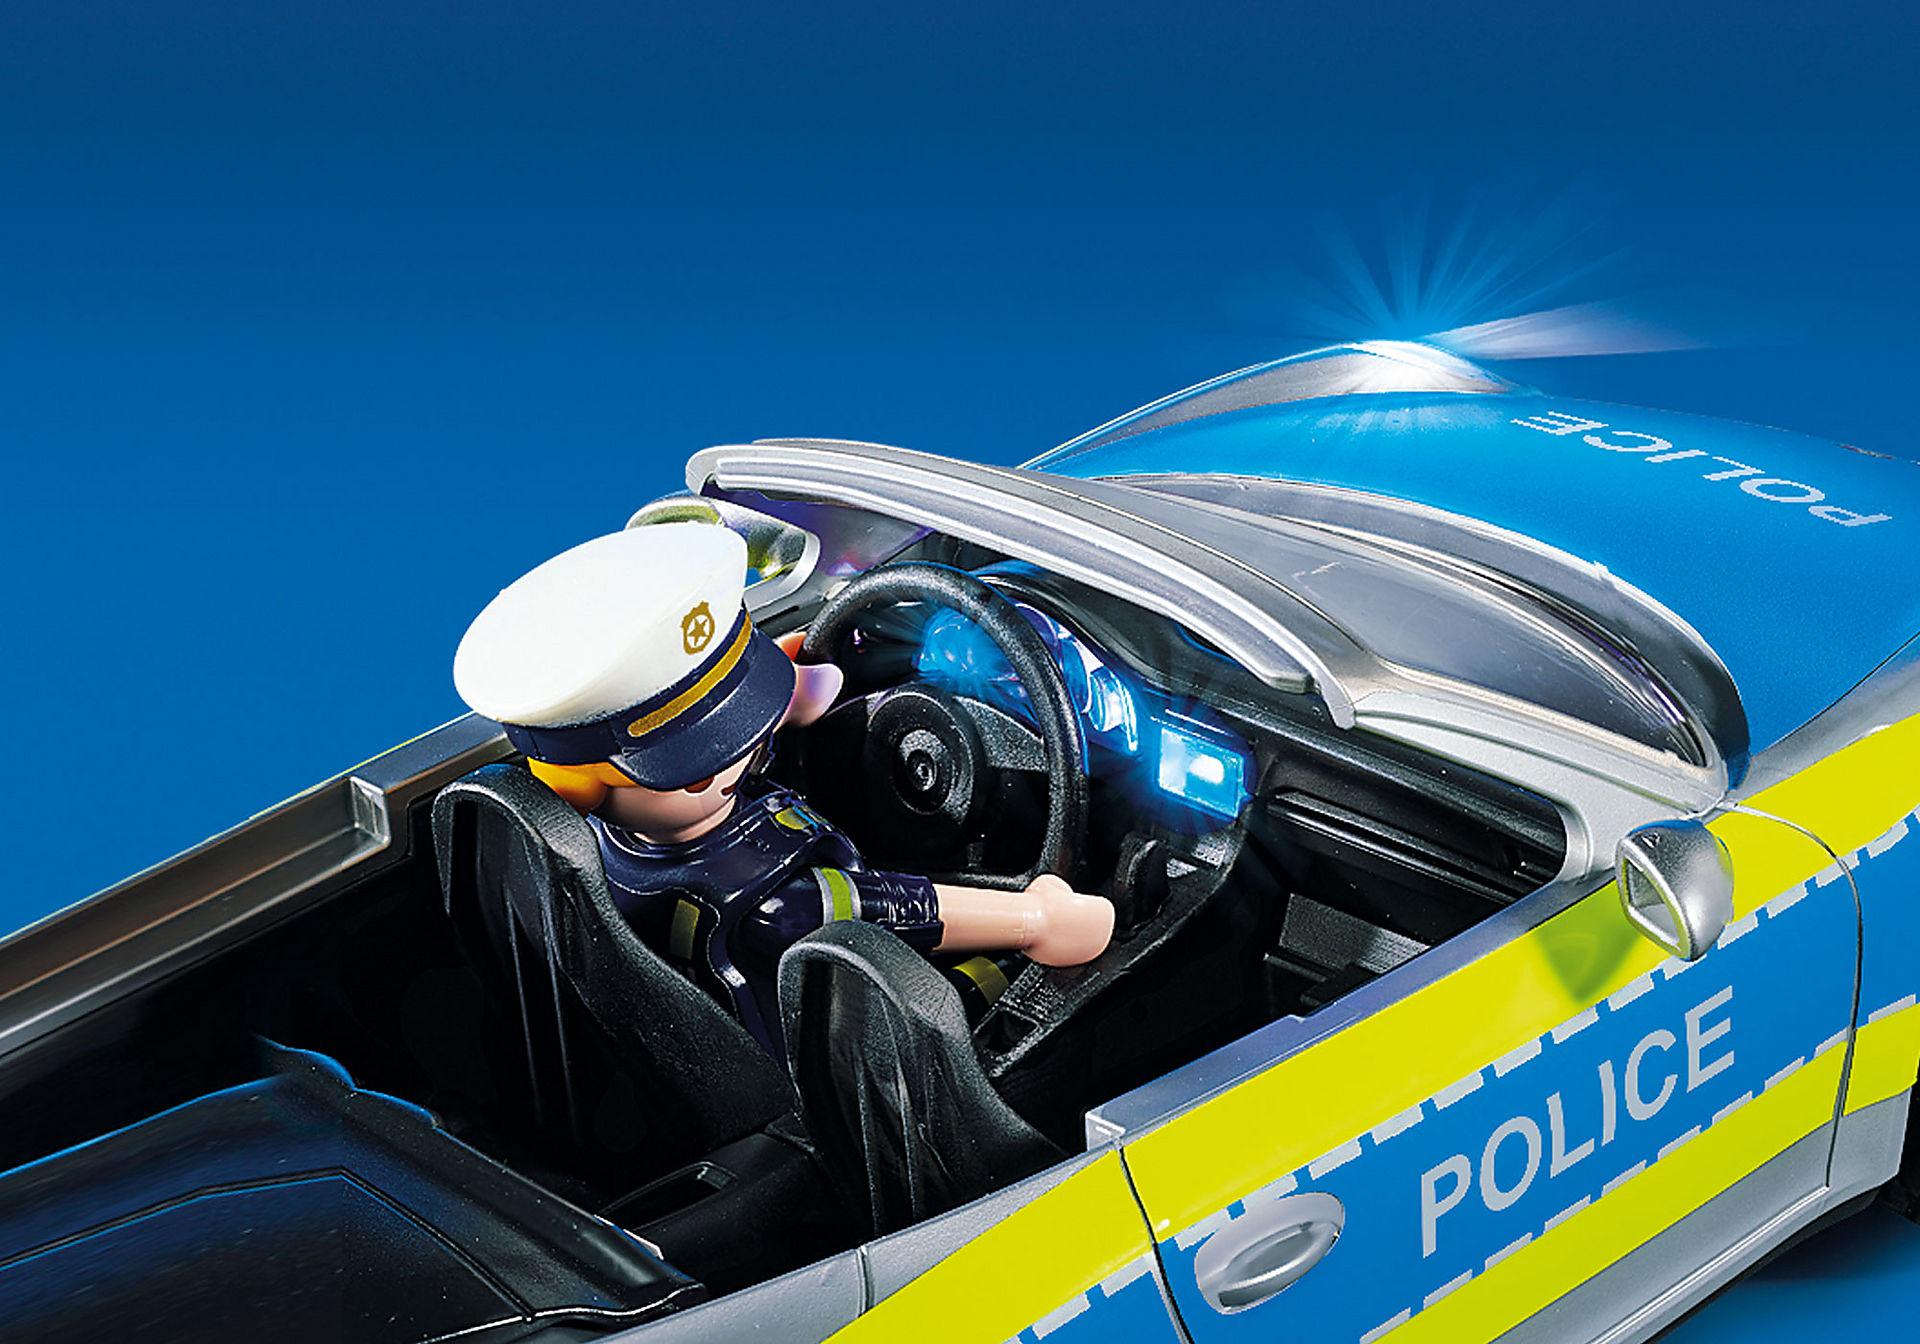 70066 Porsche 911 Carrera 4S Αστυνομικό όχημα zoom image7